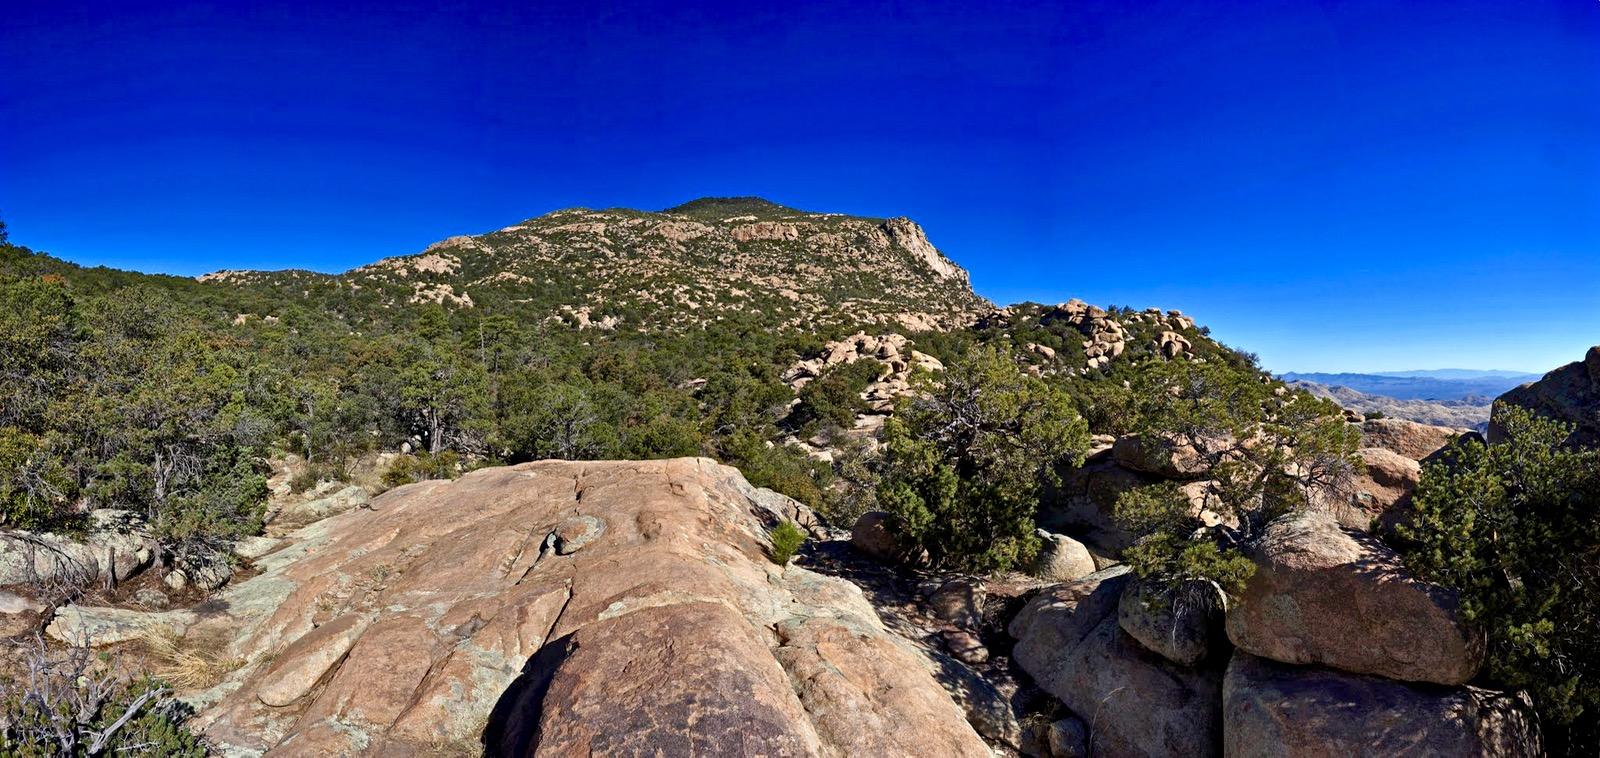 Earthline The American West Rincon Peak 8 482 Saguaro